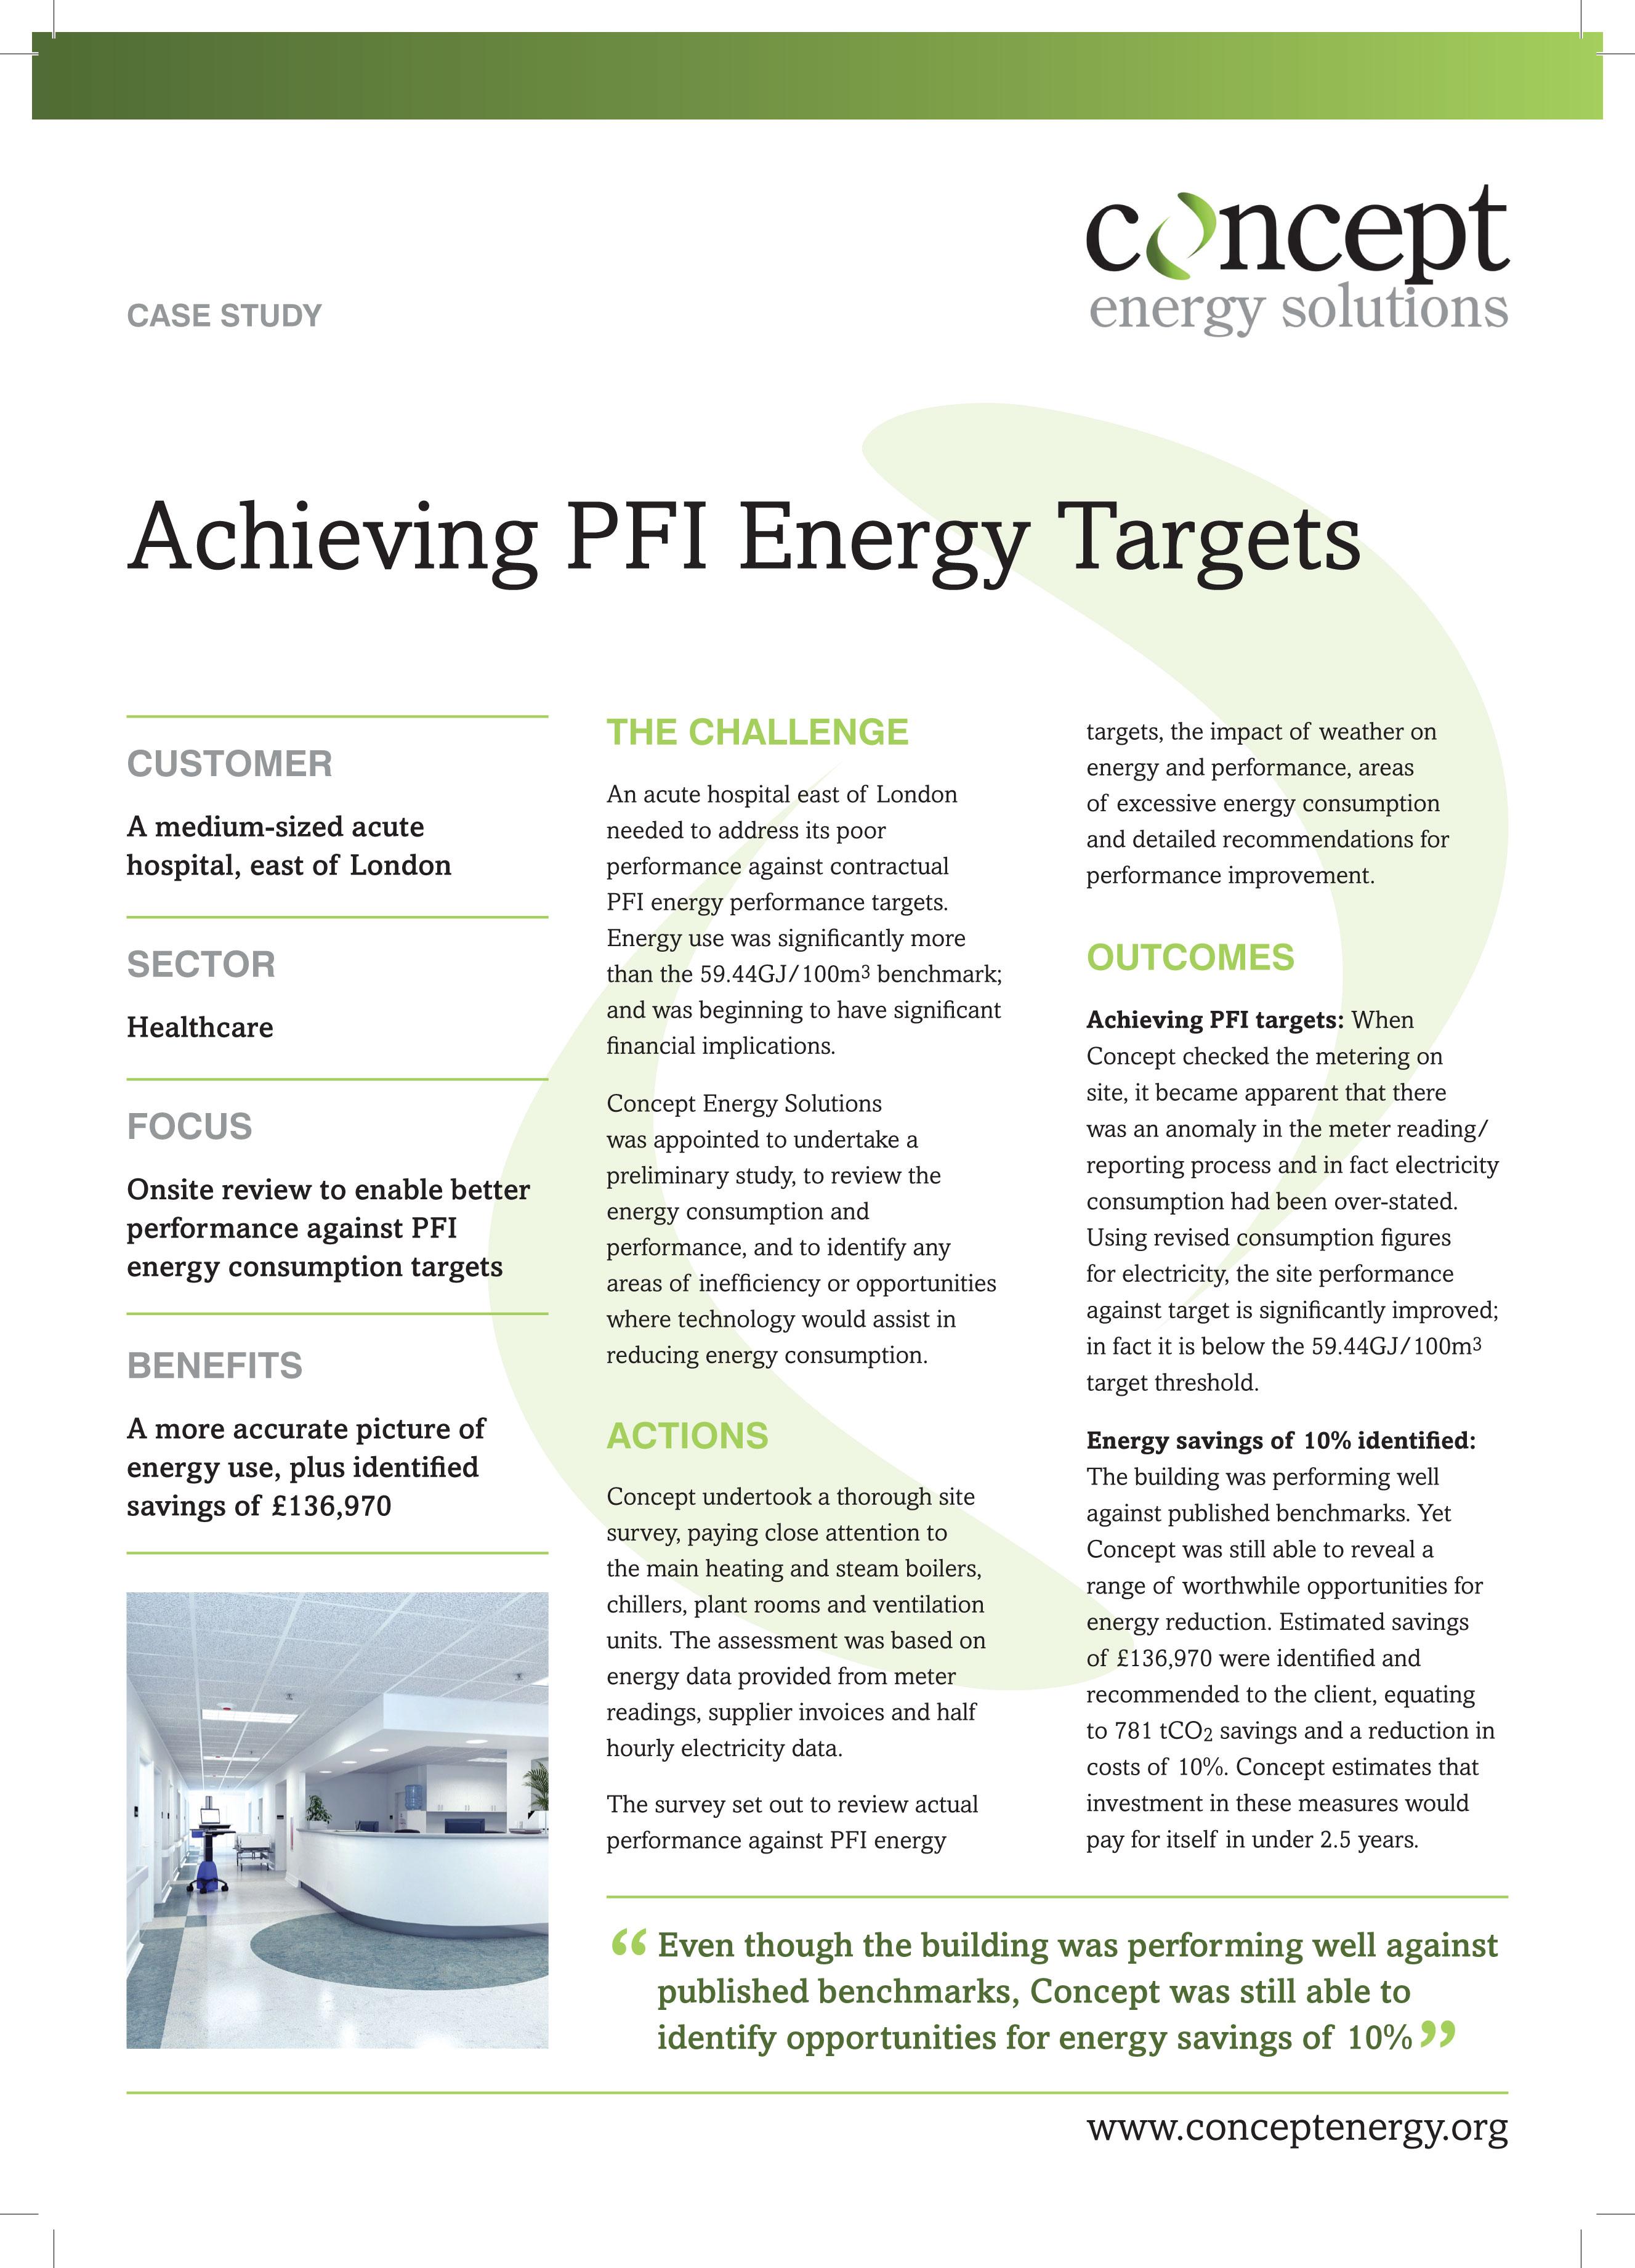 PFI Performance Monitoring | Healthcare | Concept Energy